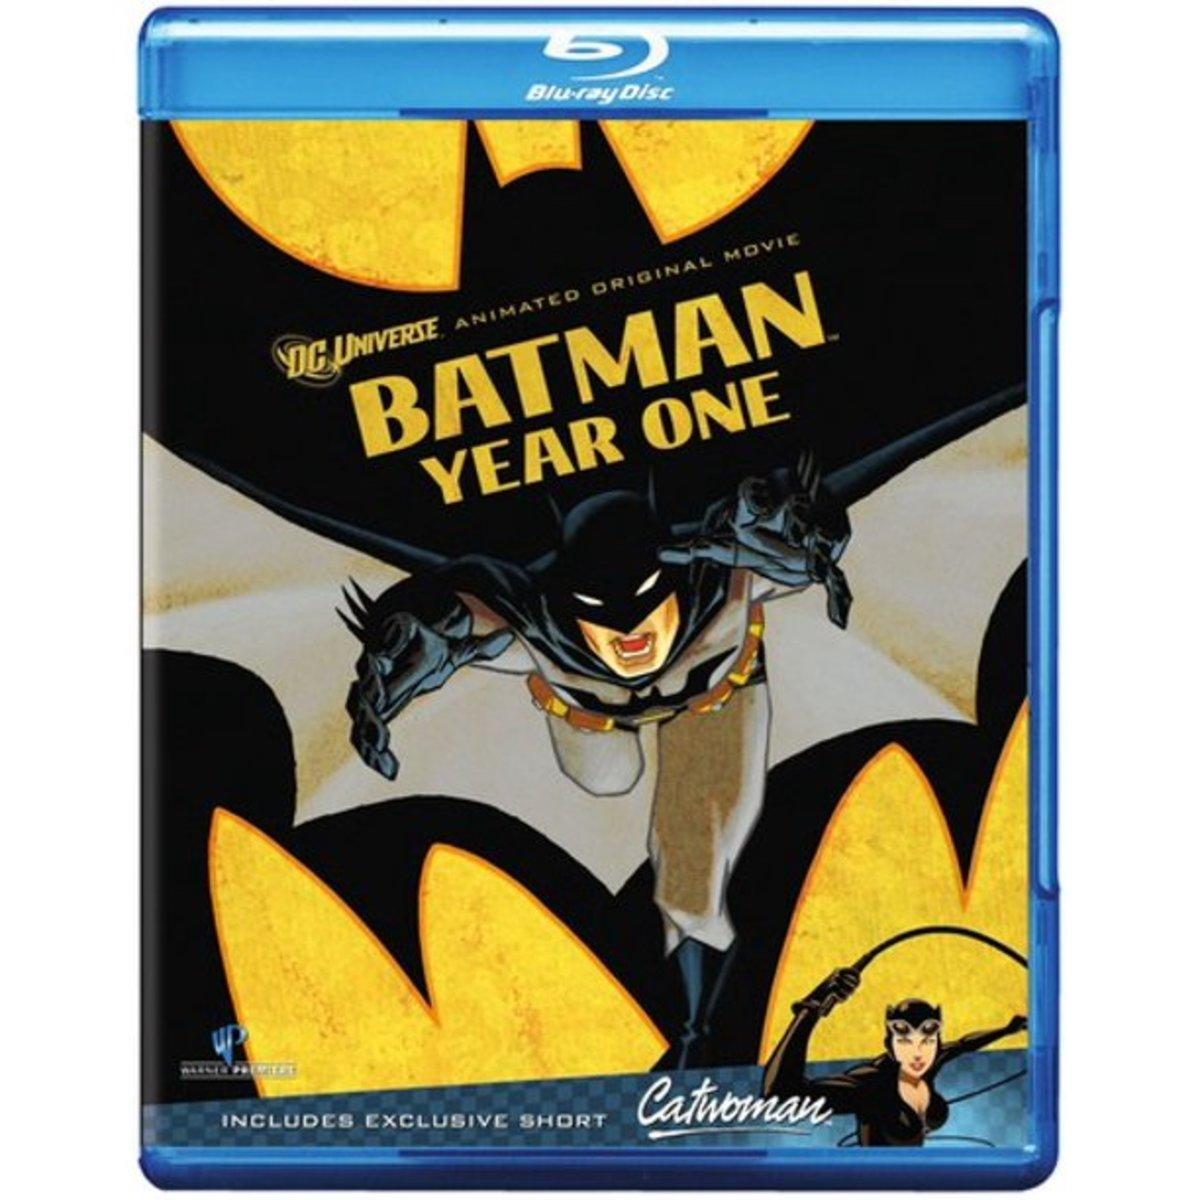 """Batman: Year One"" blu-ray cover art."